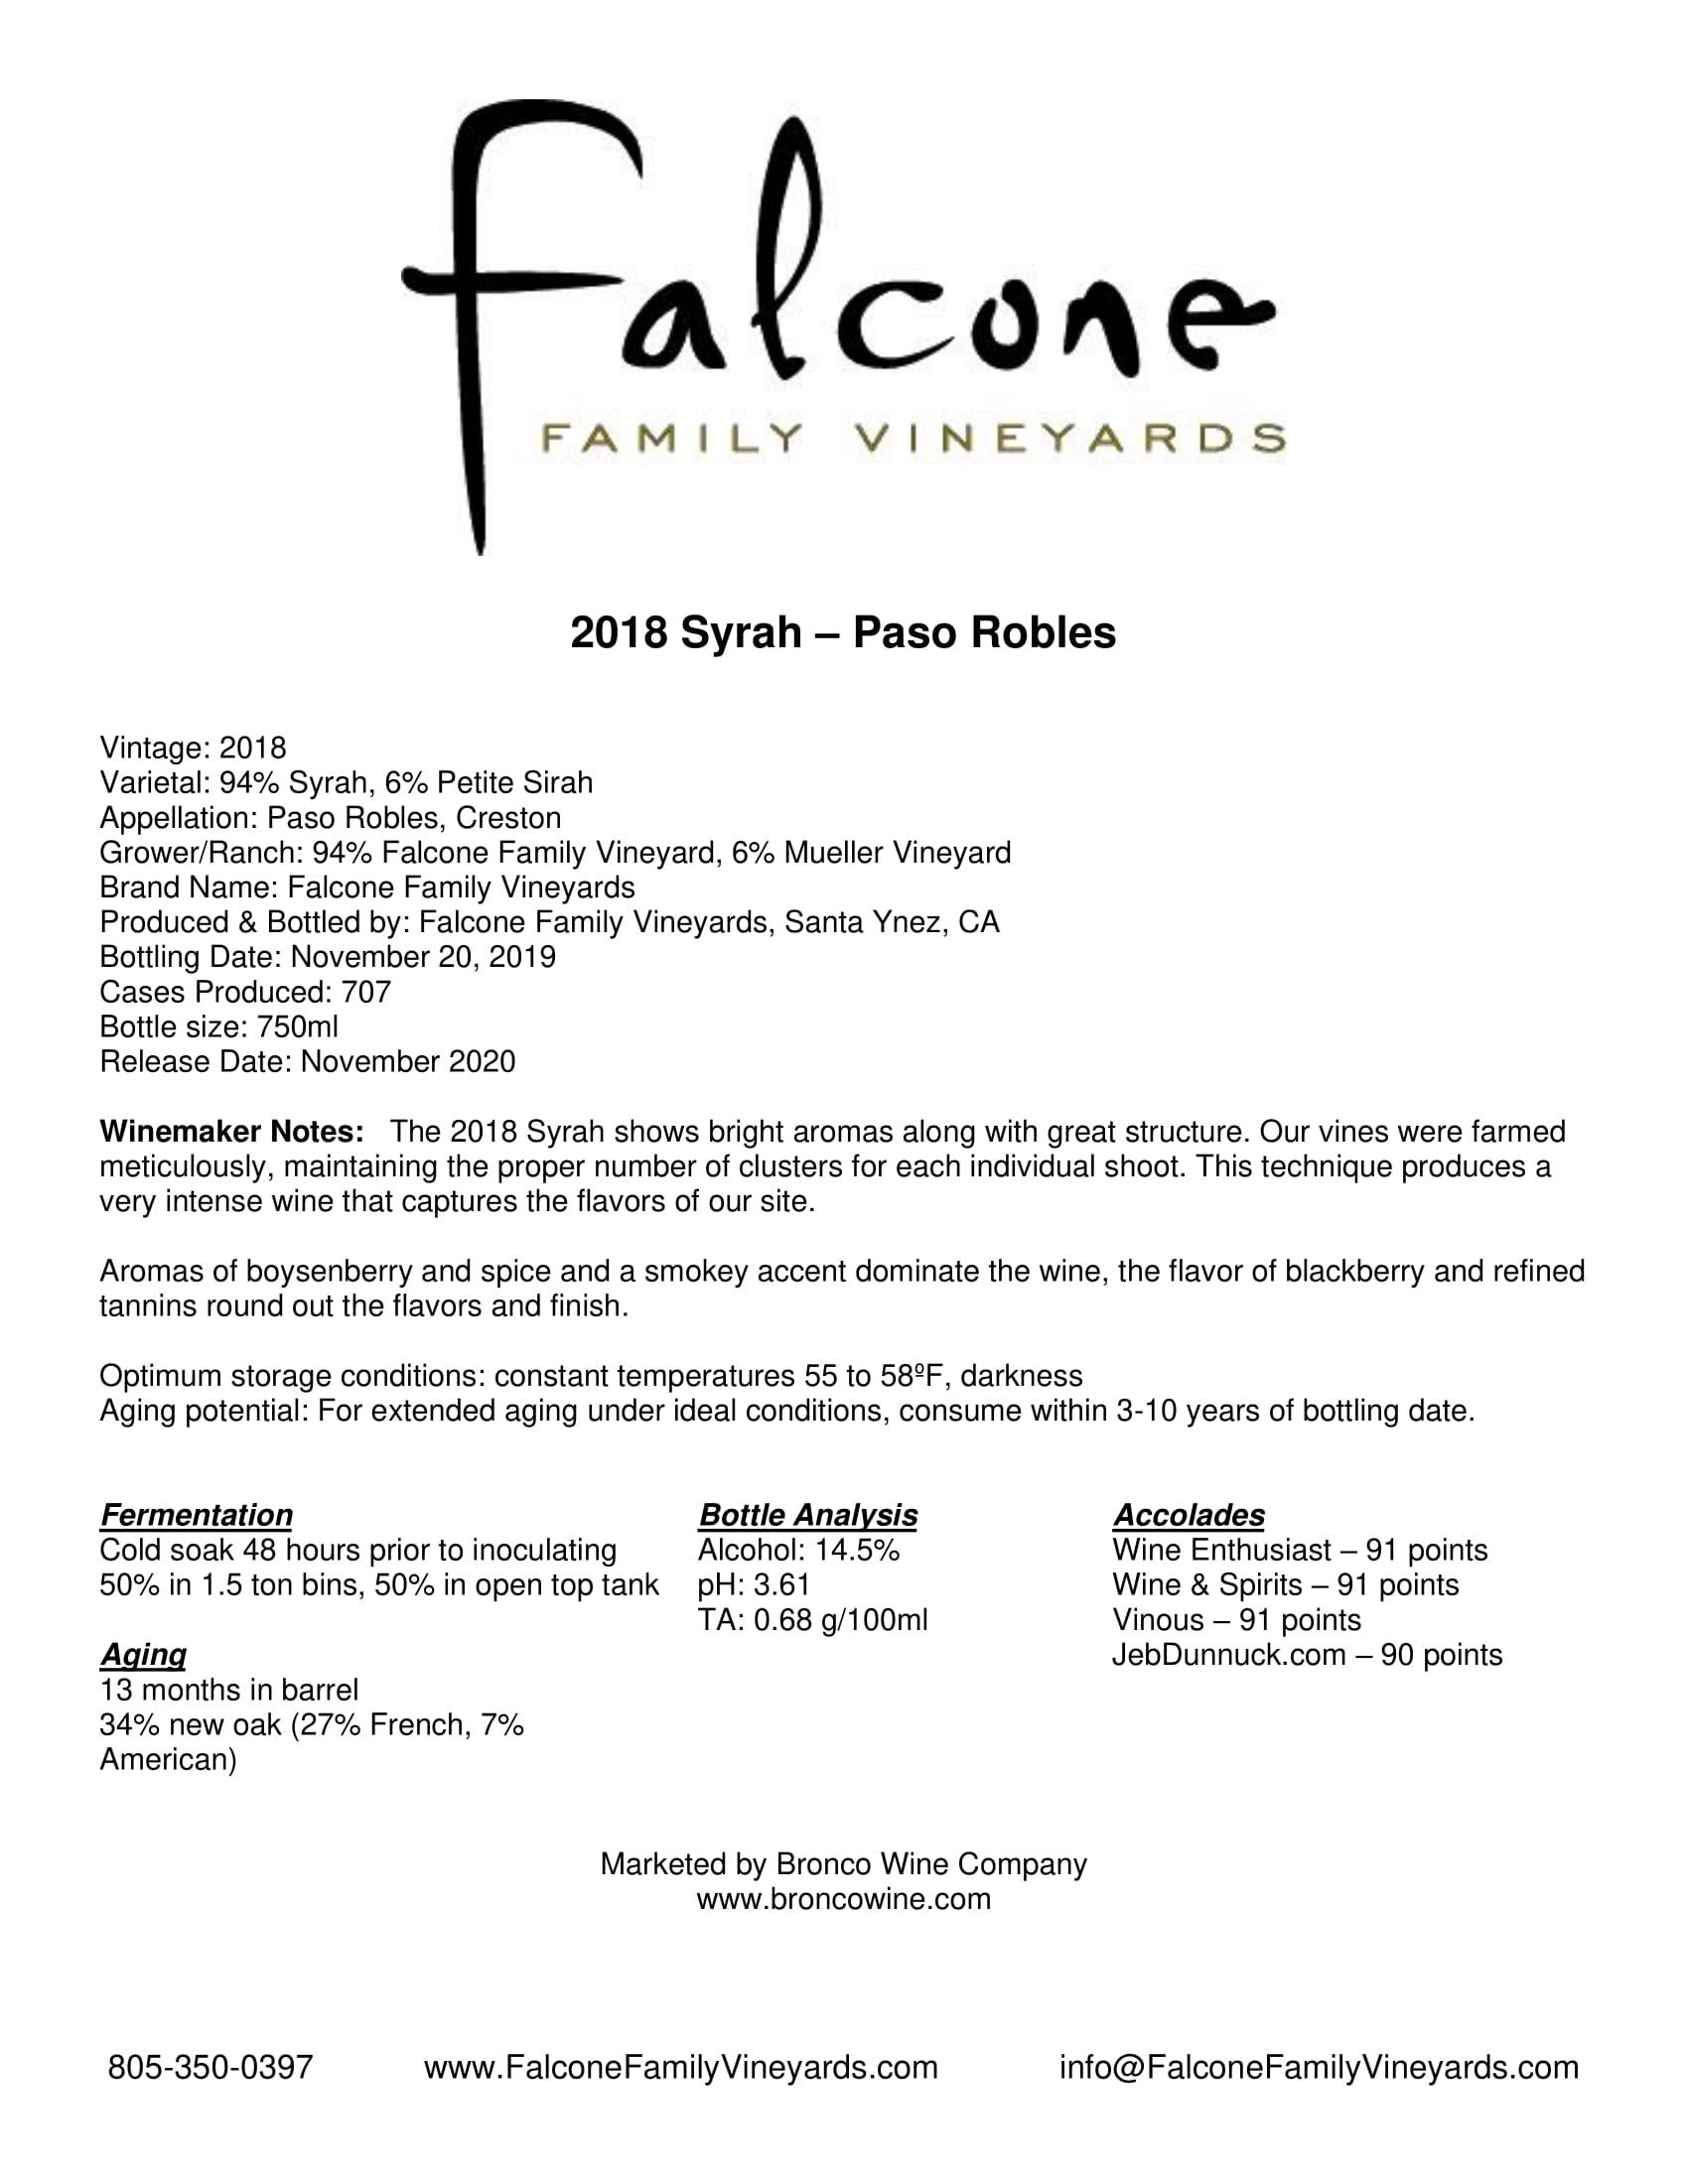 Falcone Family Vineyards Syrah Tech Sheet